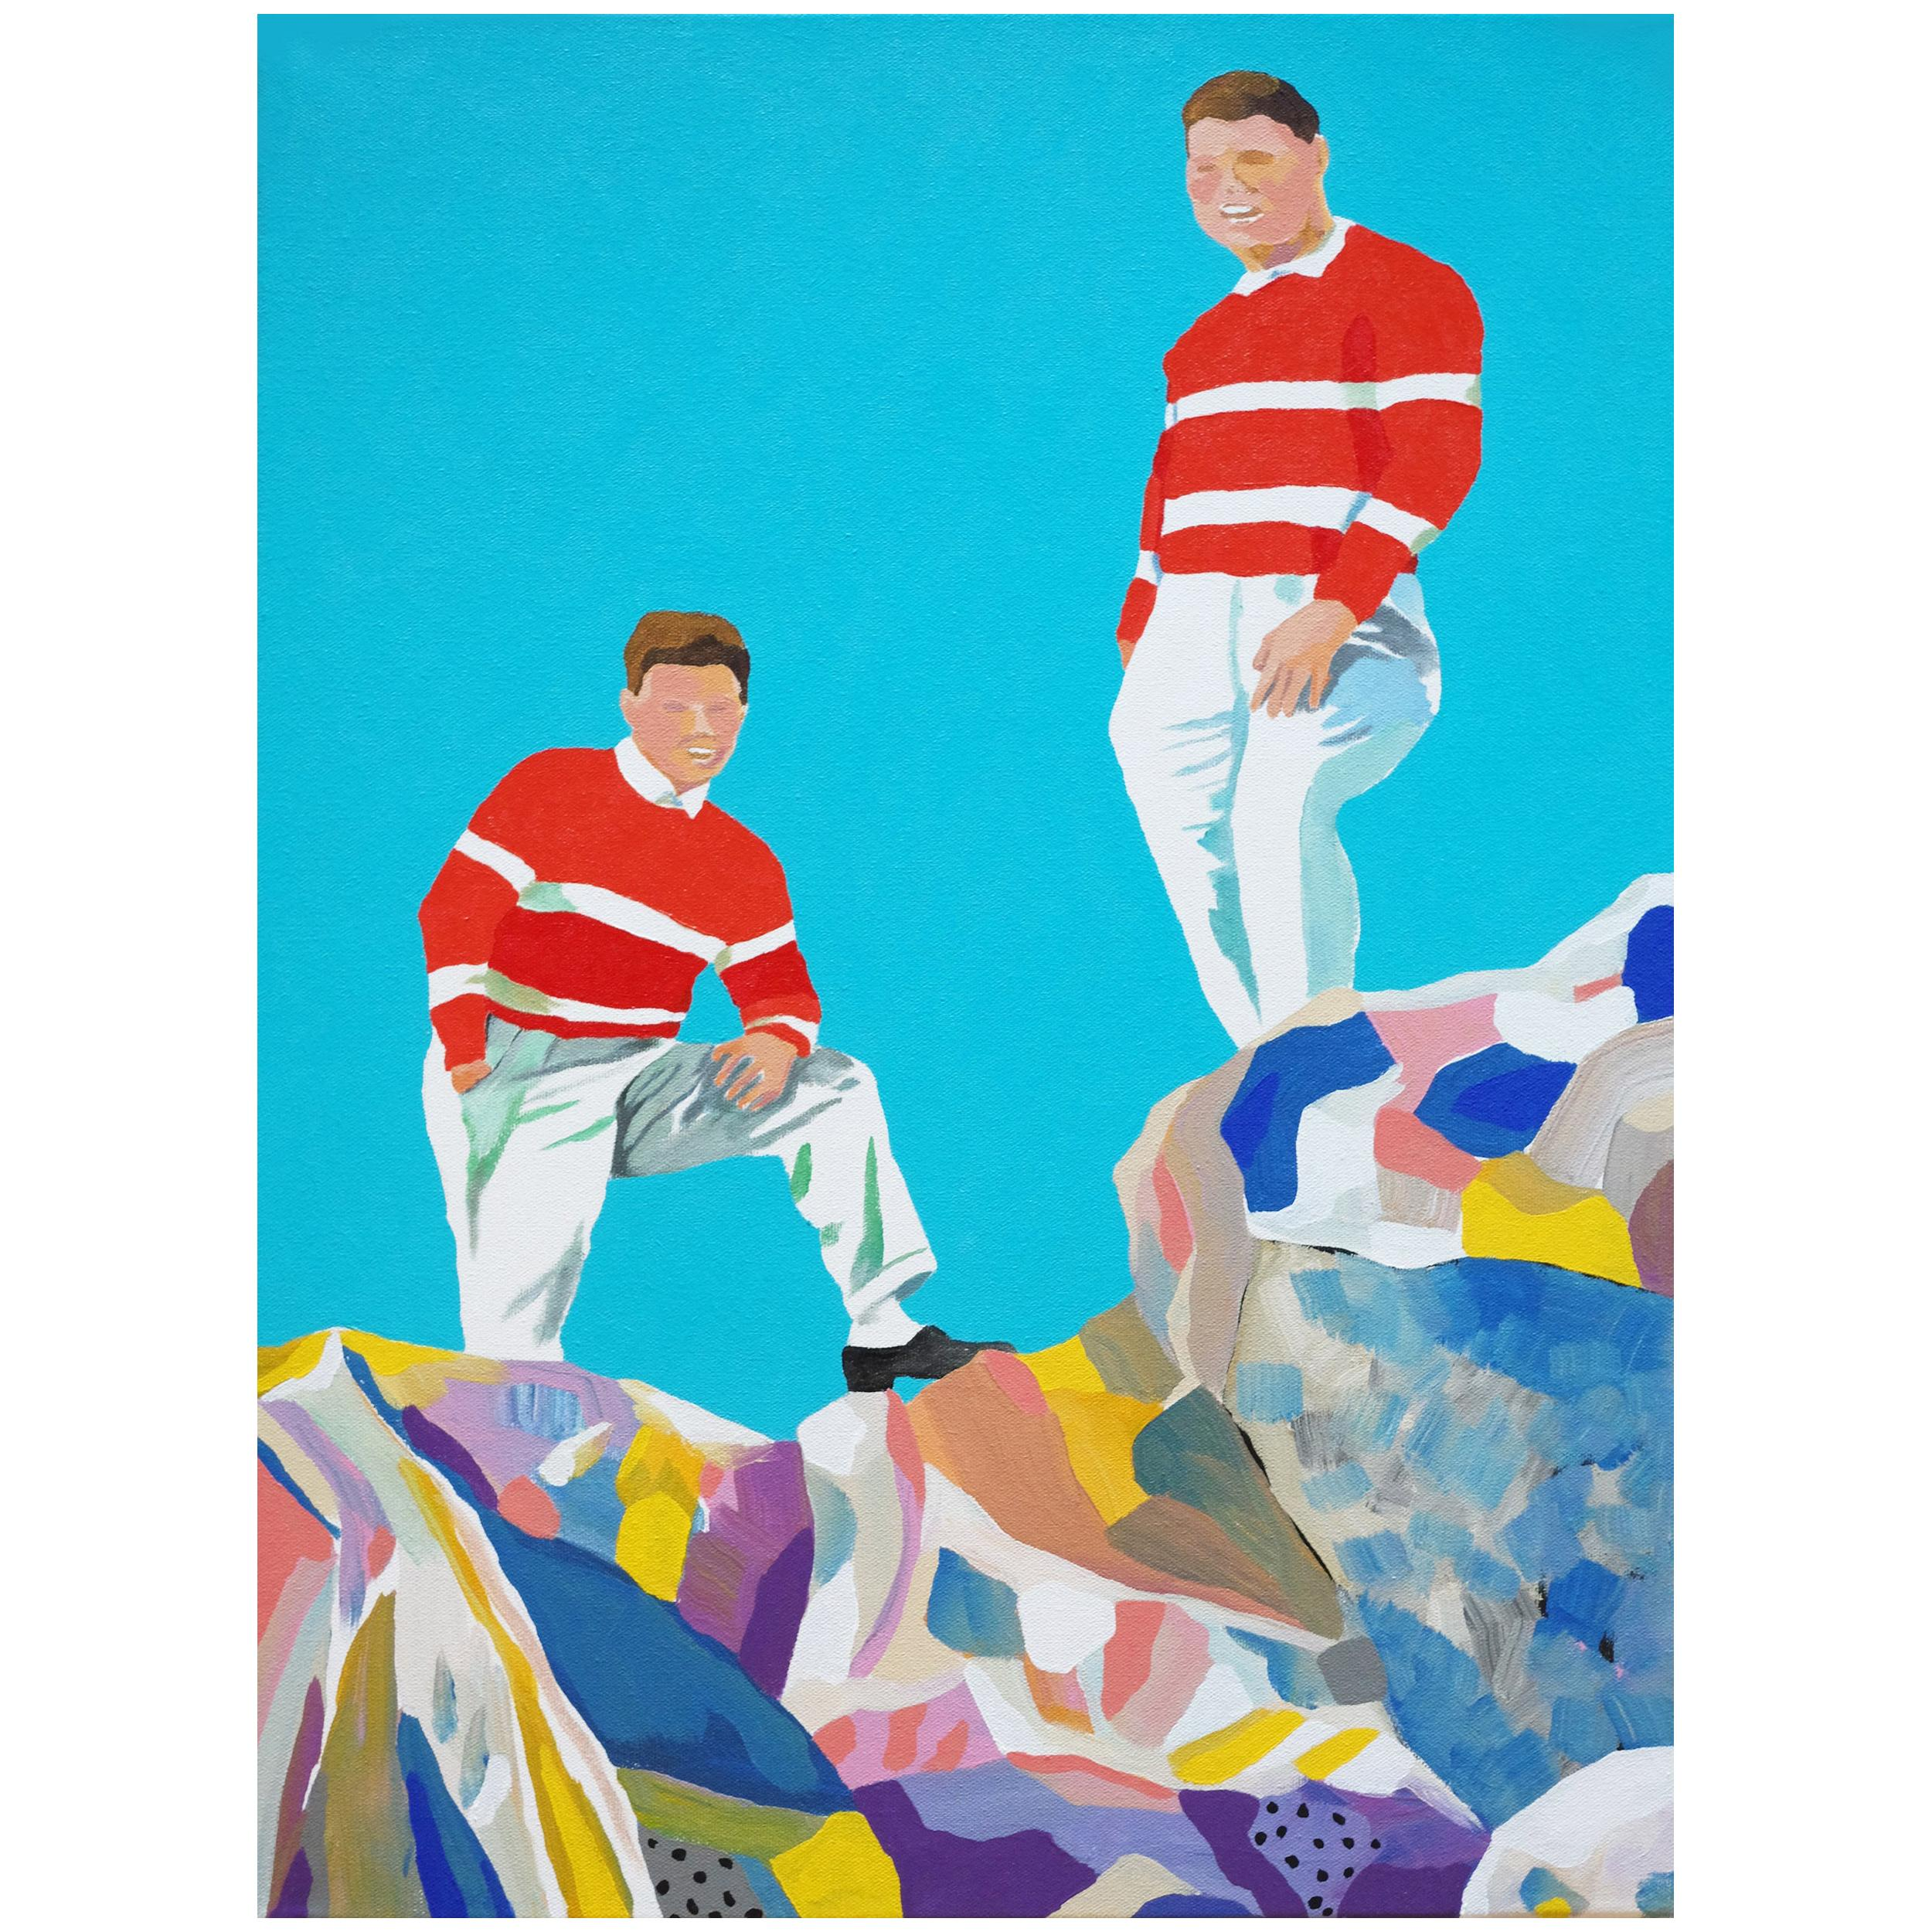 'Conservative Views' Portrait Painting by Alan Fears Pop Art